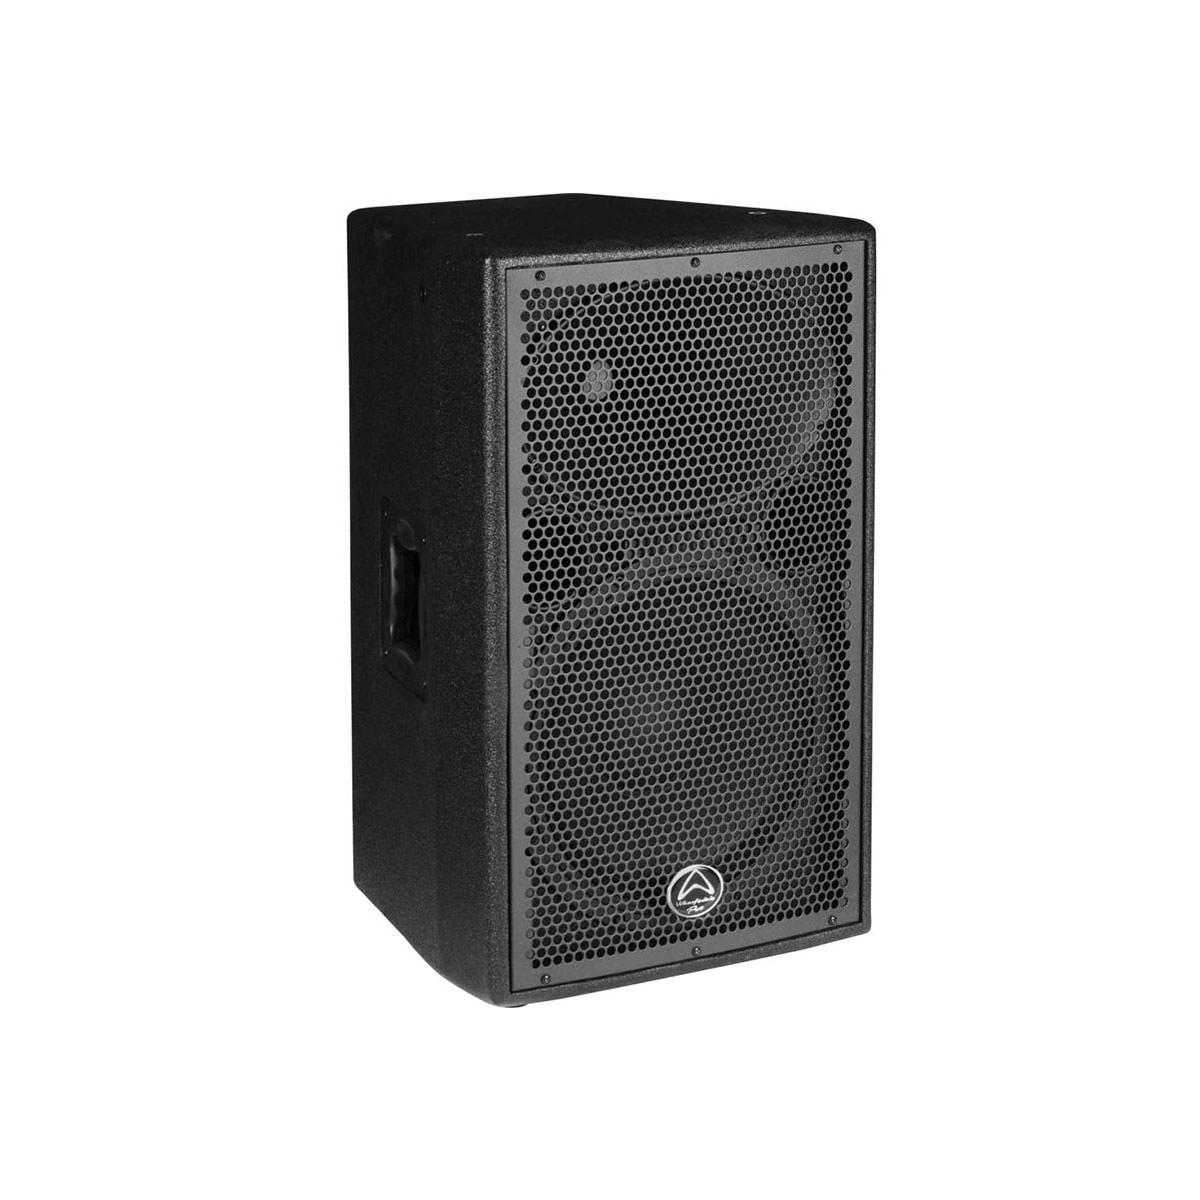 Wharfedale Delta 15 Single Speaker